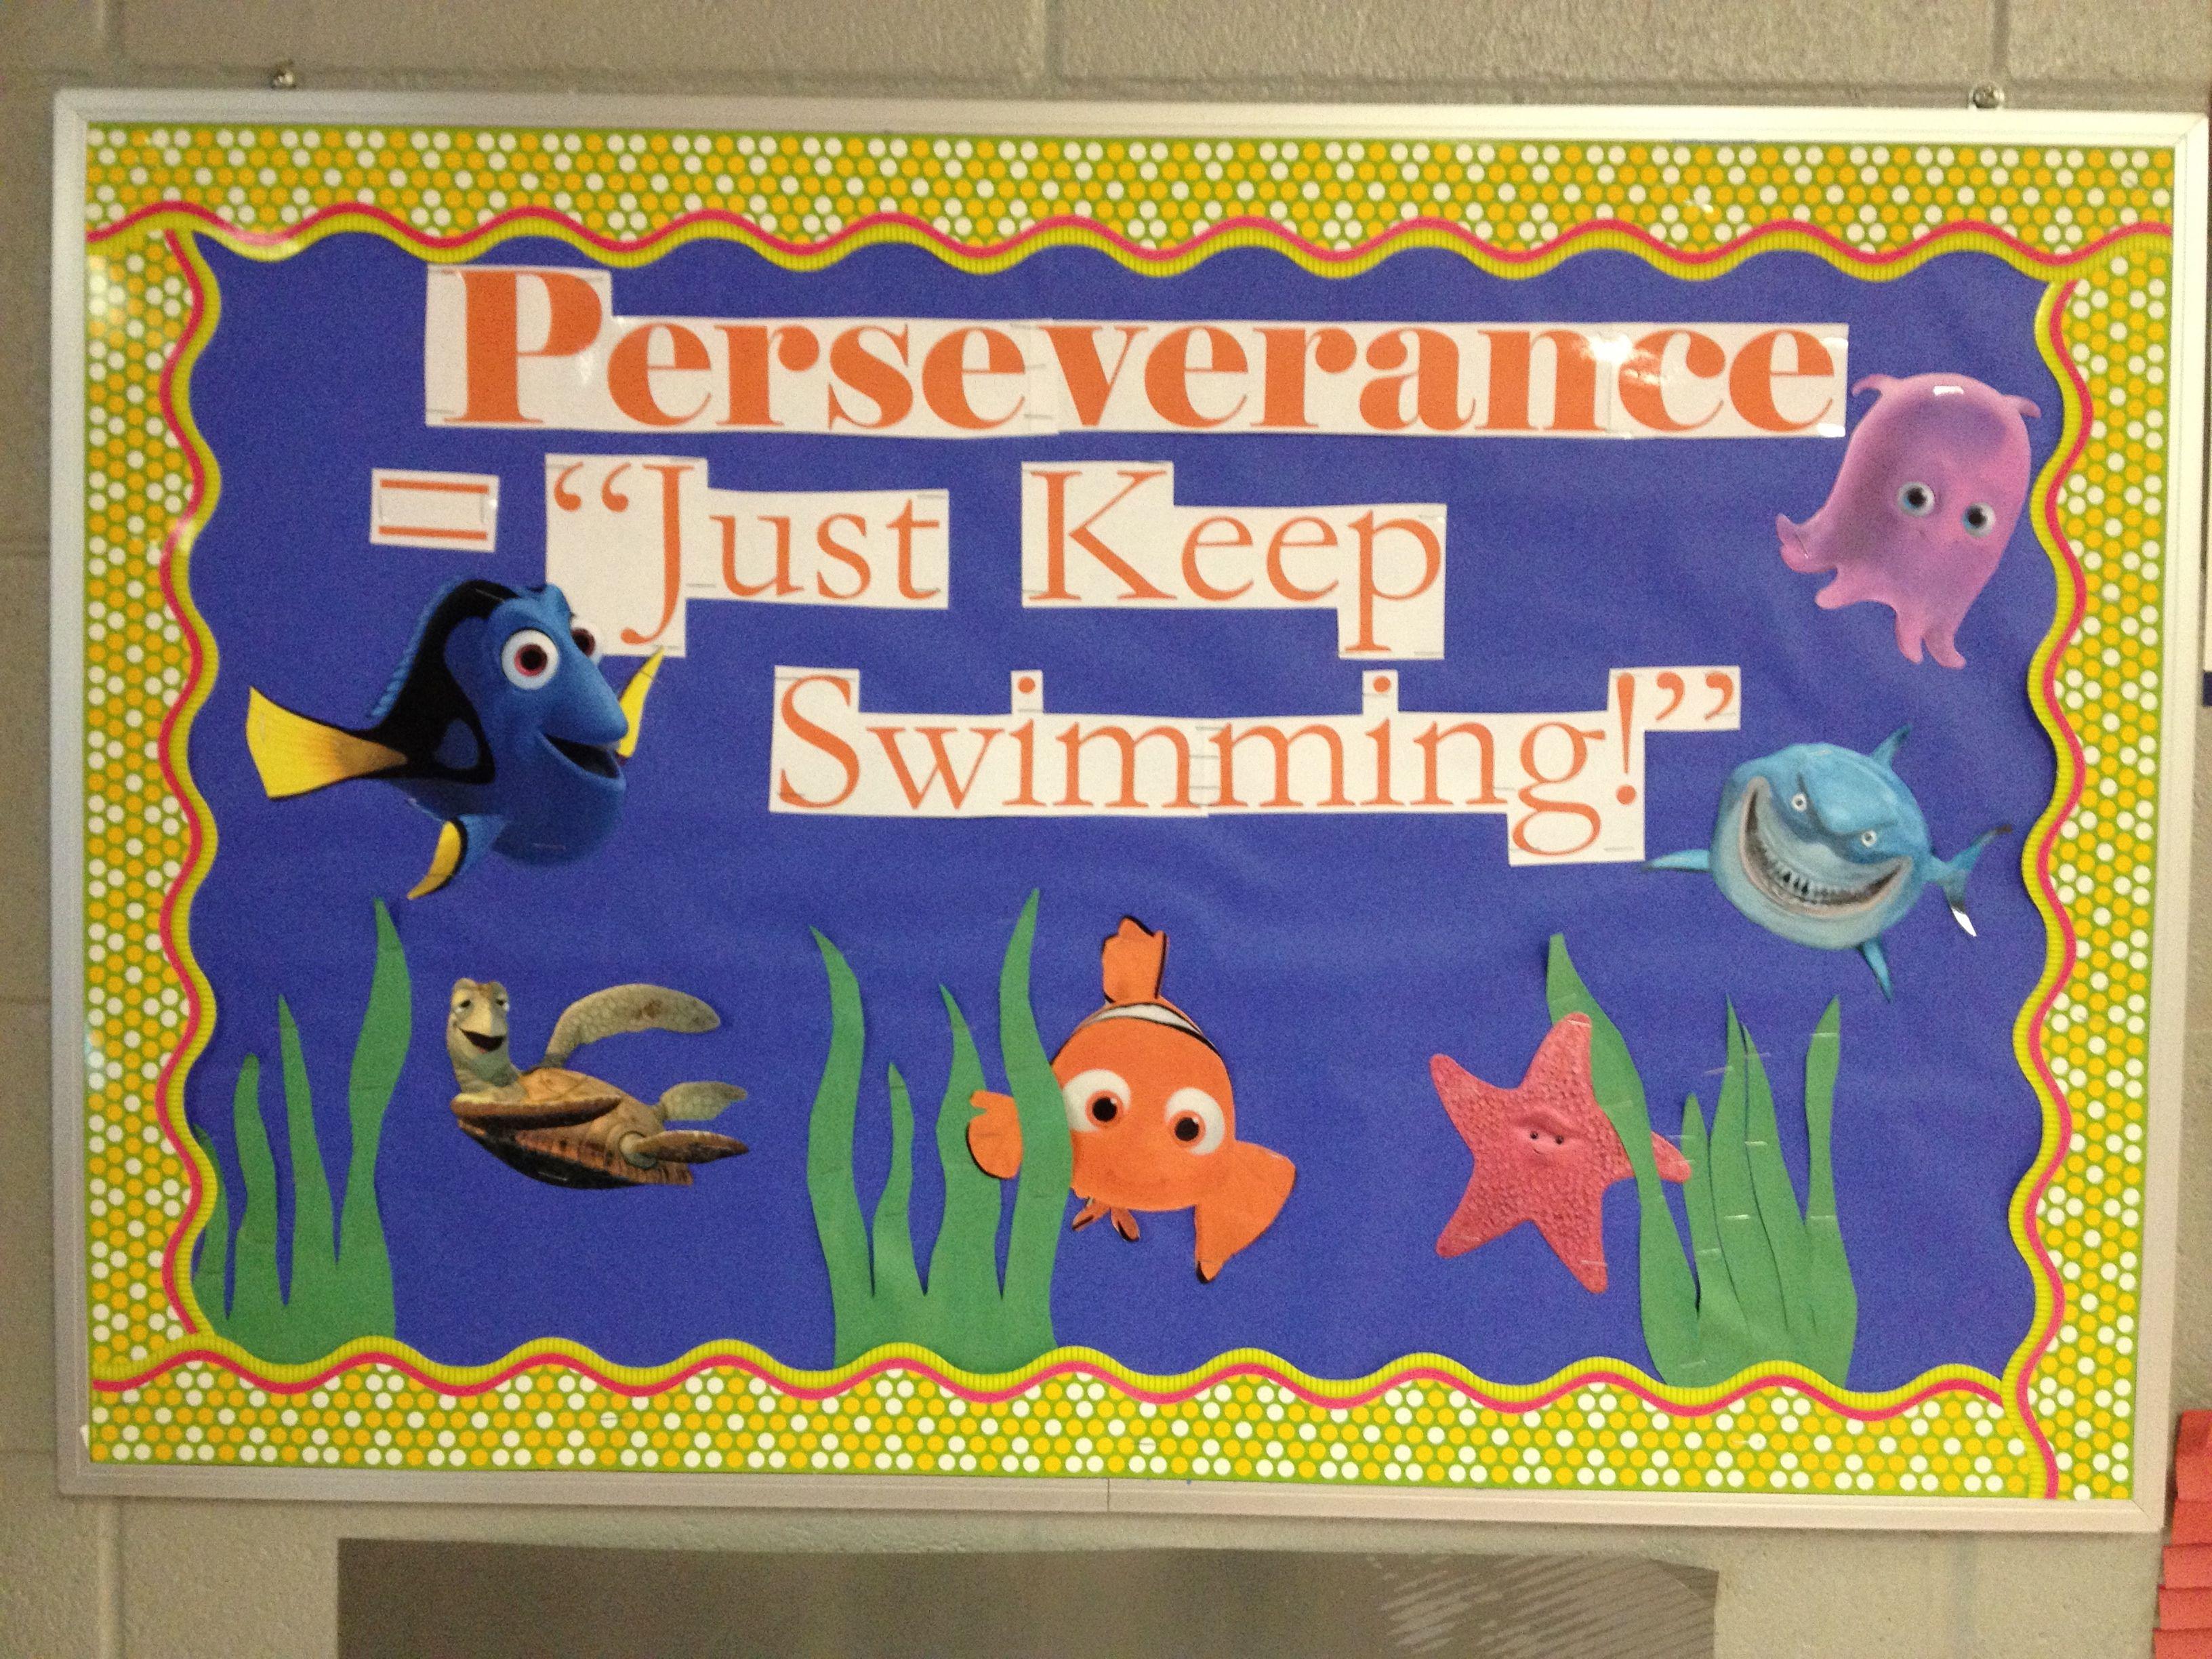 Perseverance Bulletin Board  Just Keep Swimming